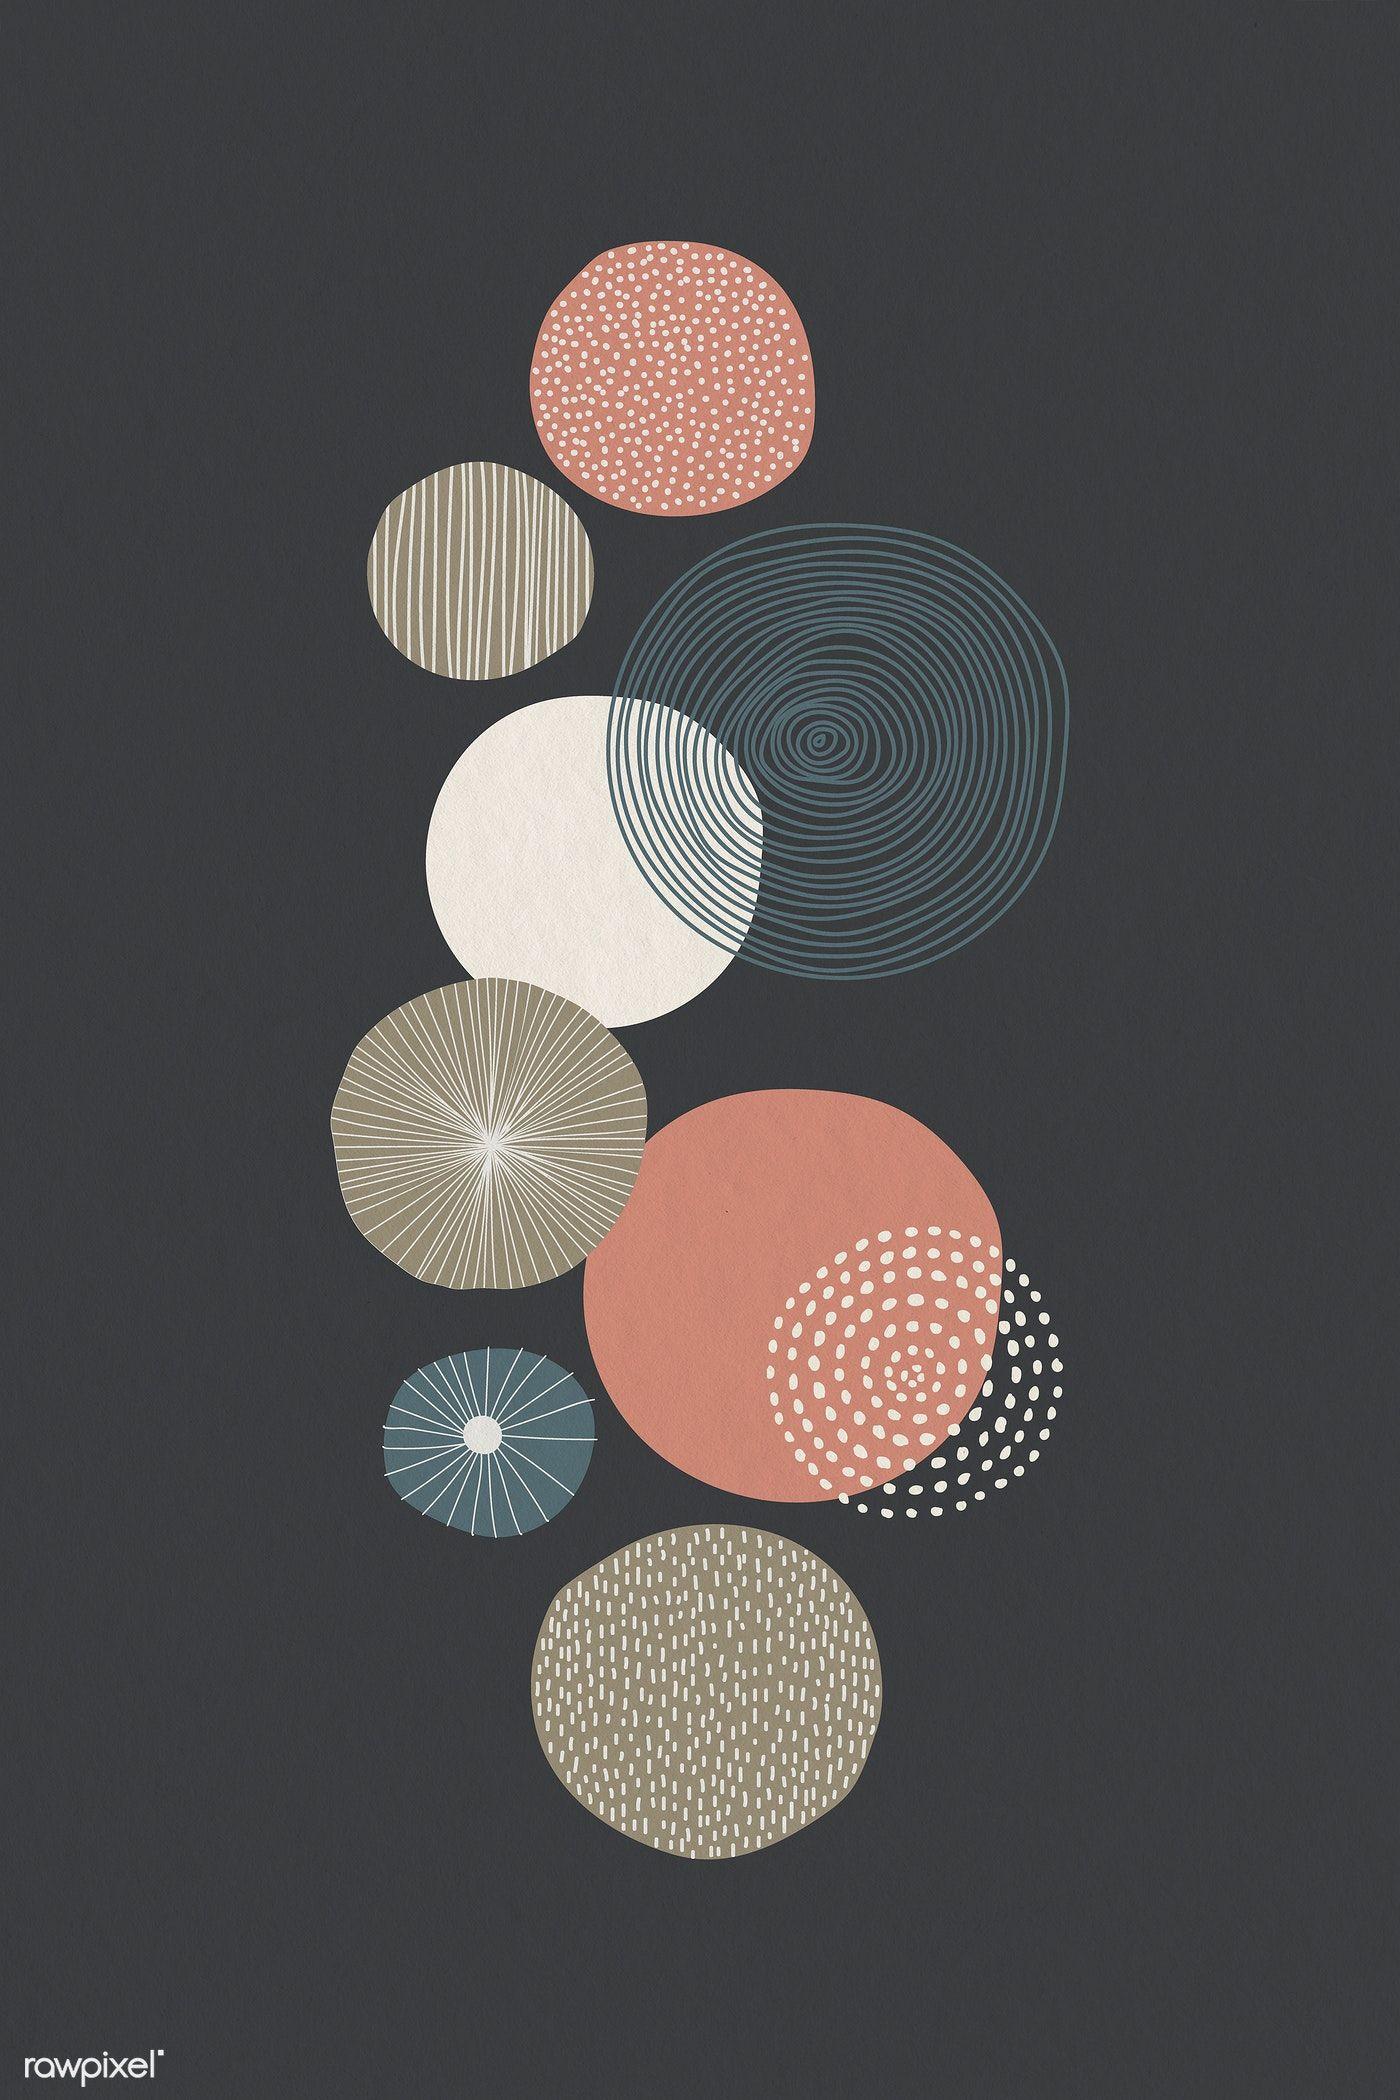 Download Premium Illustration Of Round Patterned Wall Art Illustration    Geometric Art Prints, Illustration Wall Art, Doodle Background